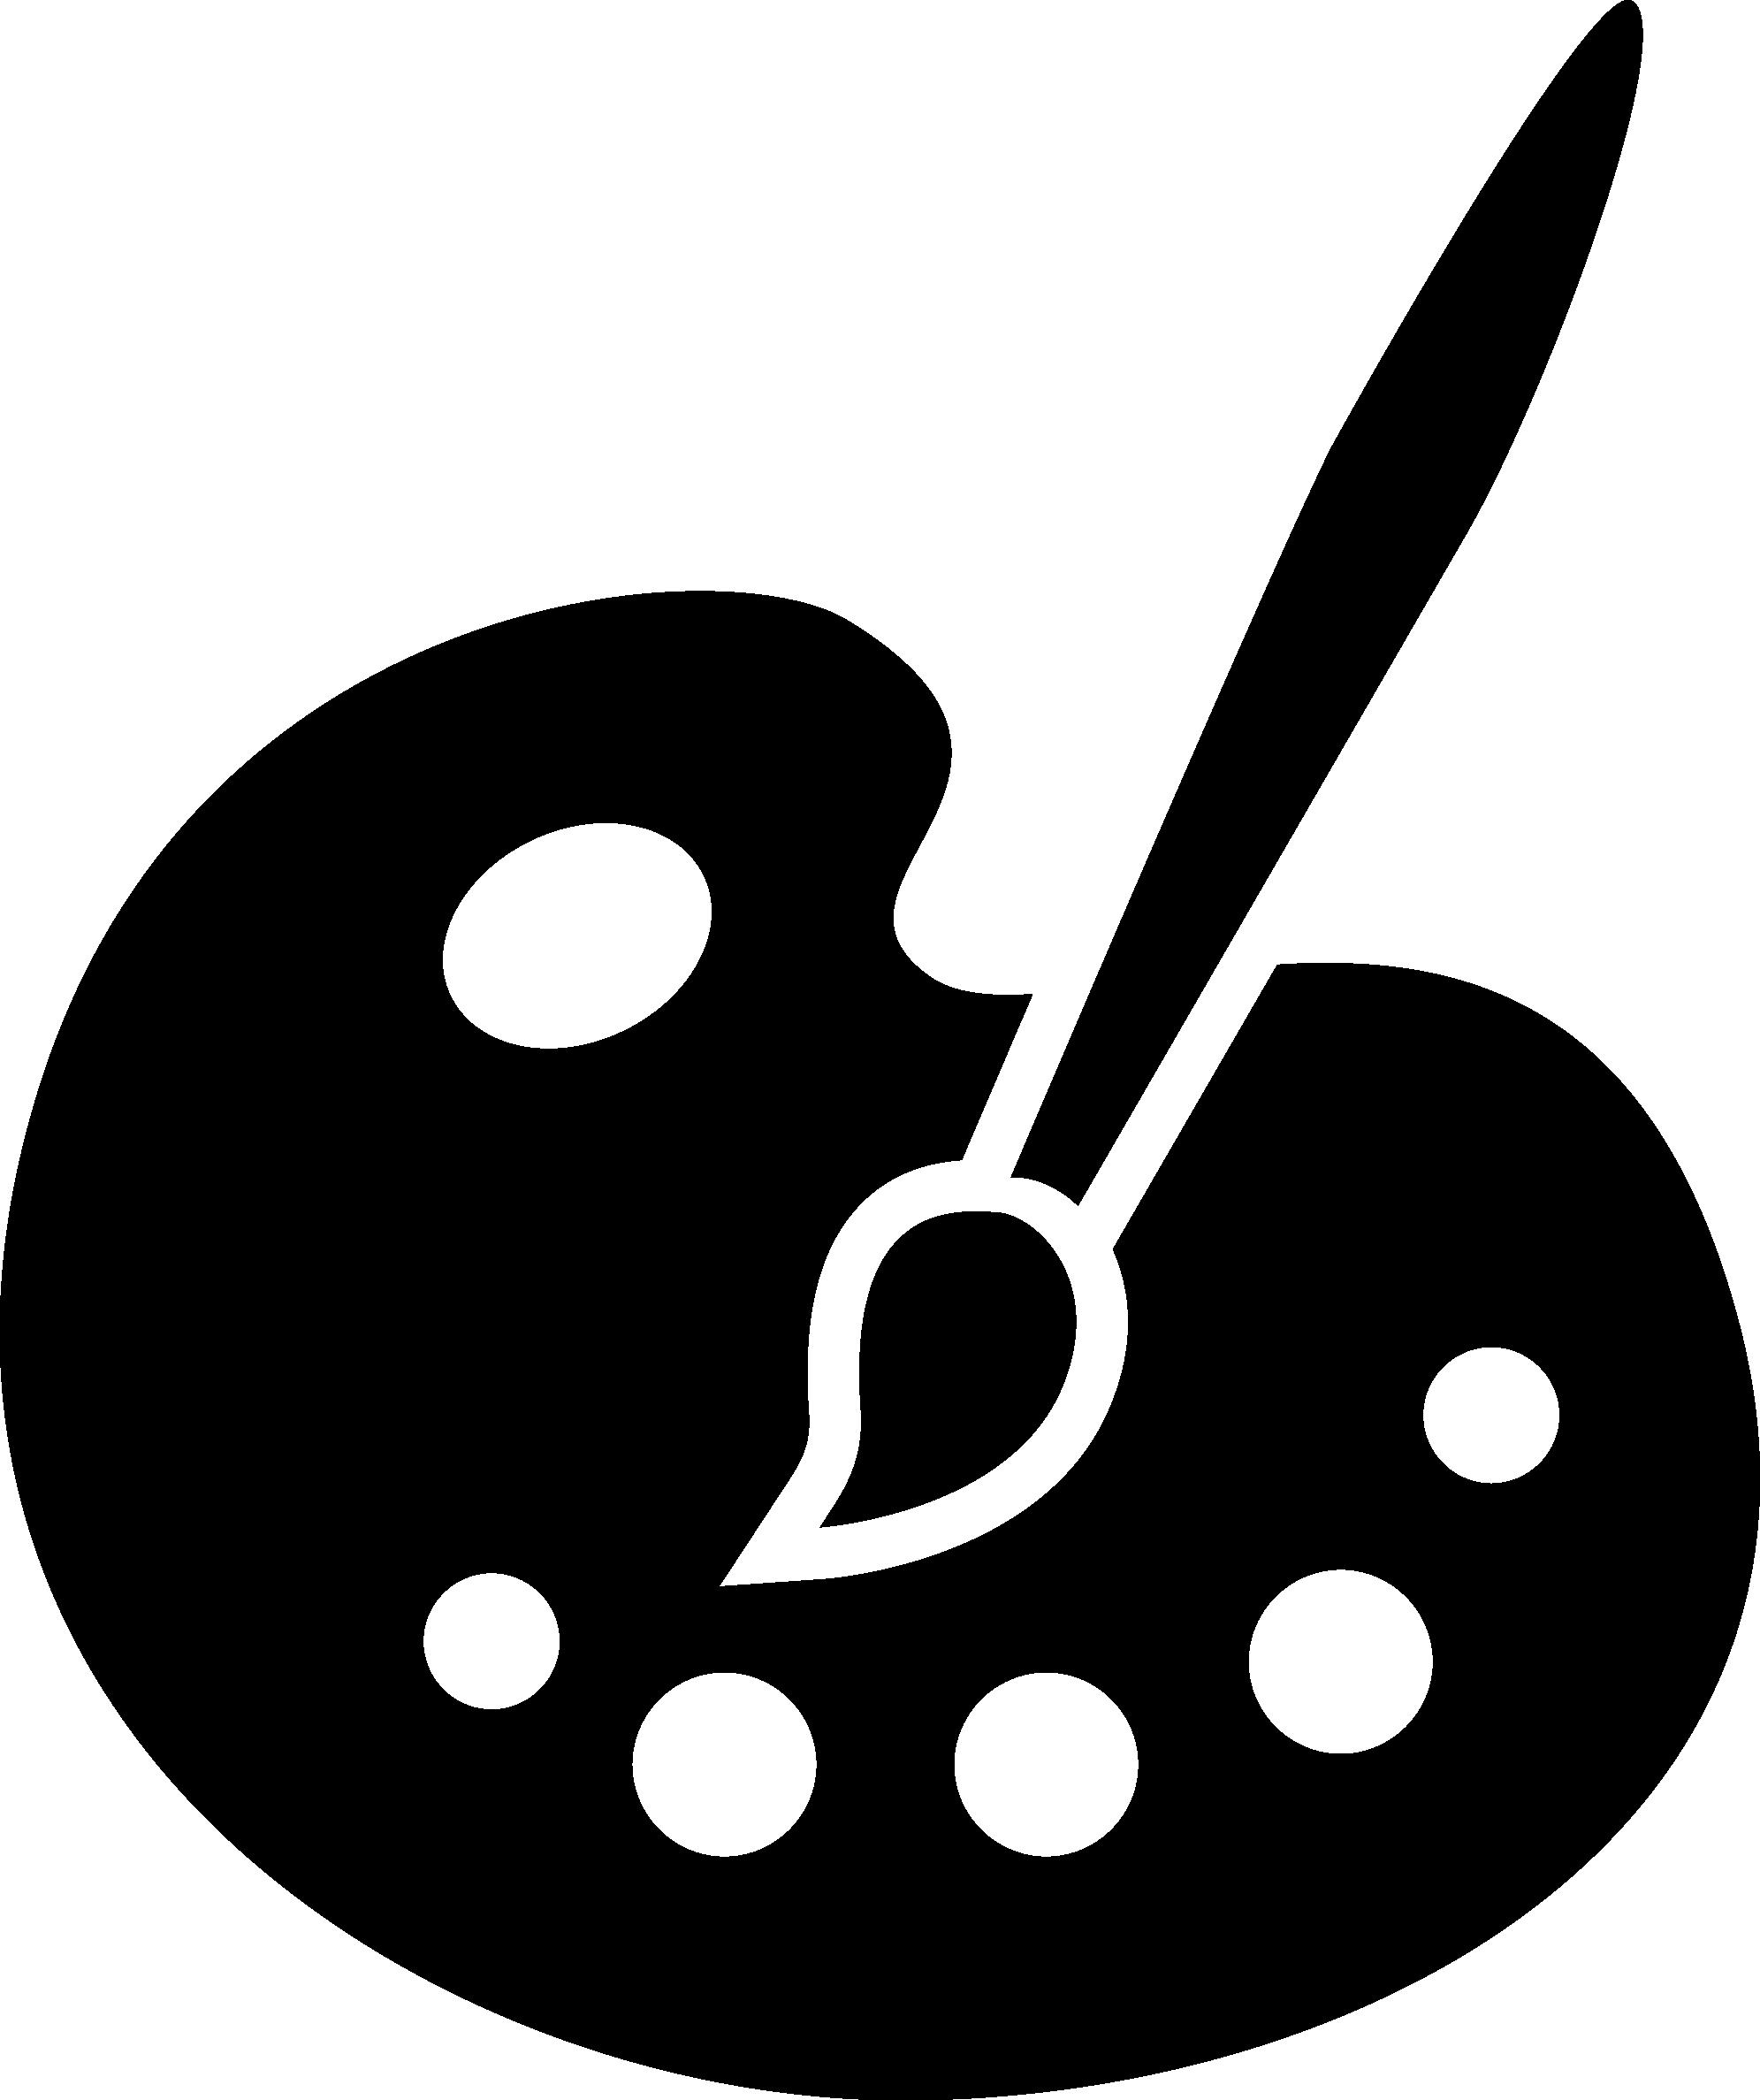 Paintbrush clipart art symbol, Picture #1810730 paintbrush clipart art  symbol